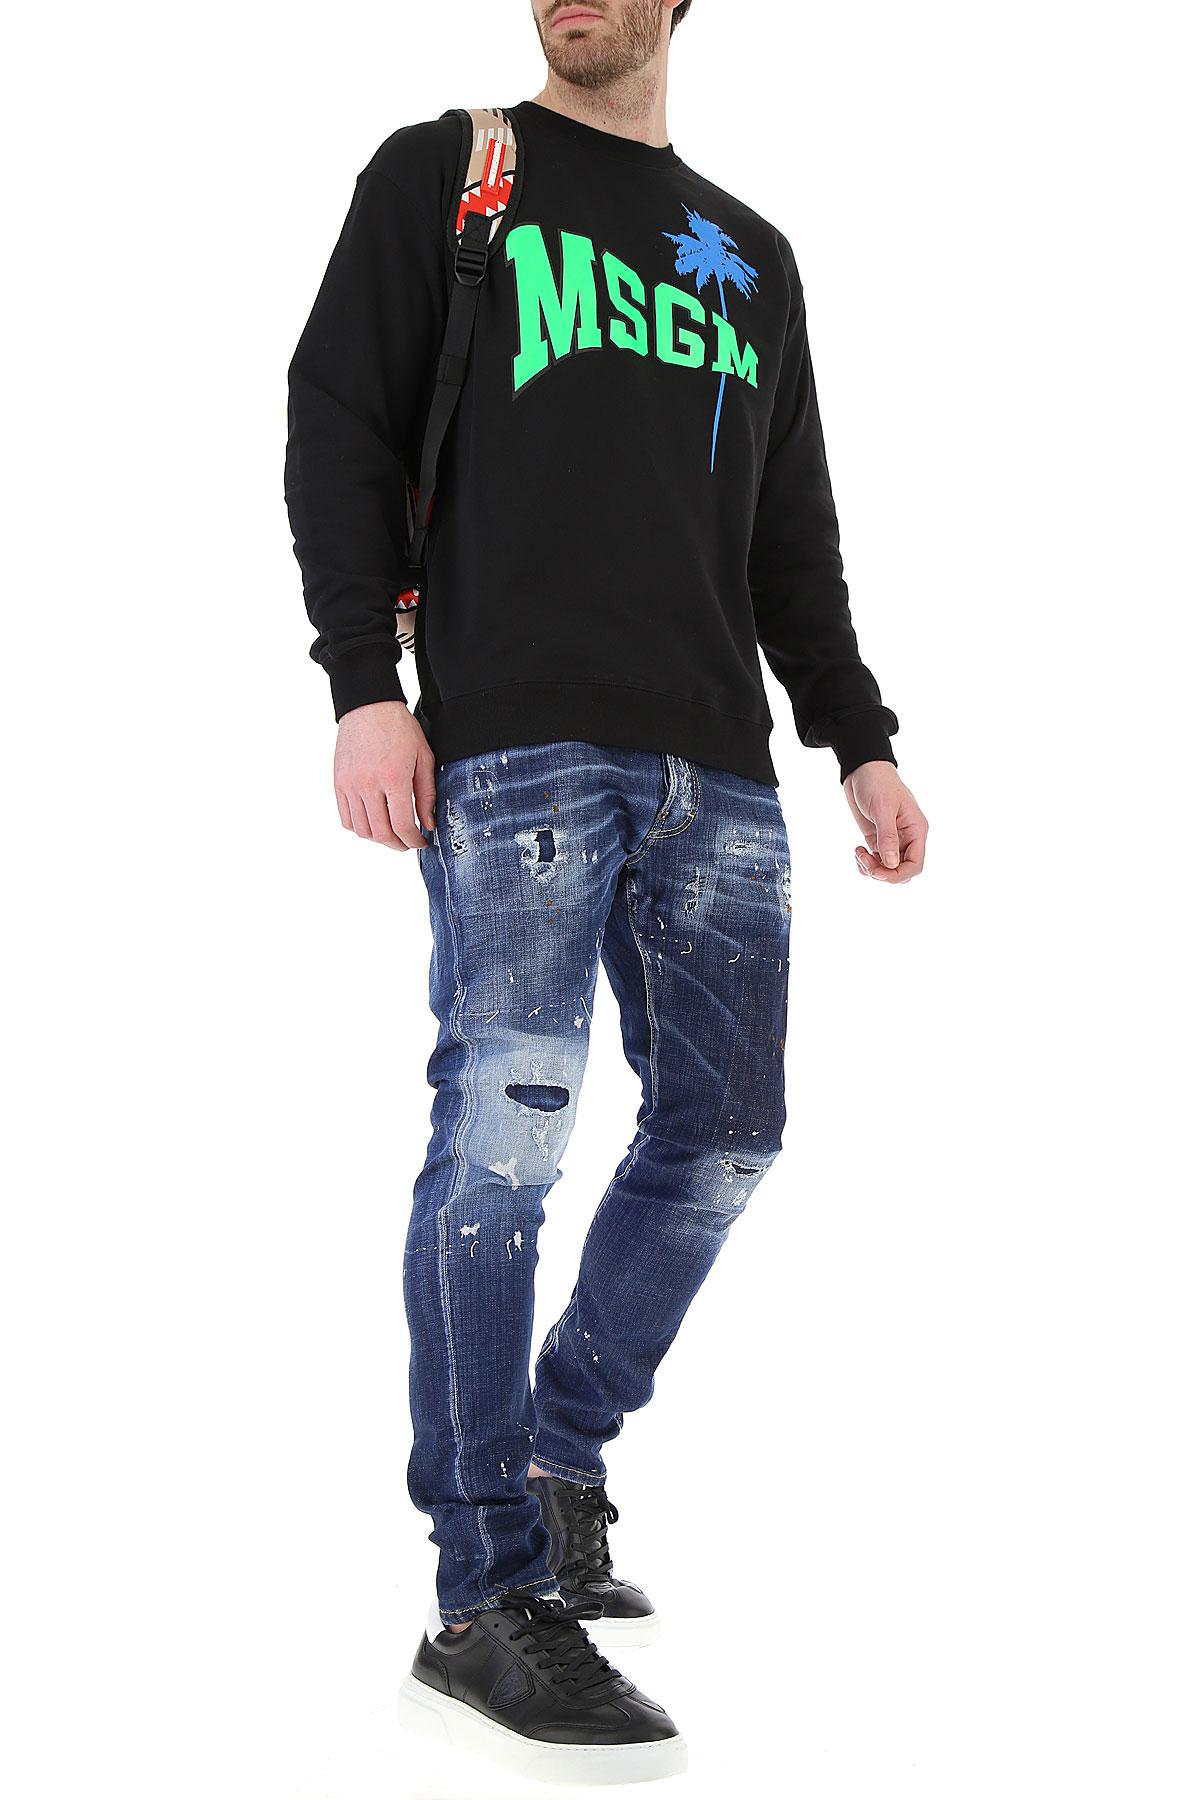 Verde verano 2019 Msgm Negro Ropa nbsp;azul Para Fluorescente Primavera Hombres 0xIvwPUqT